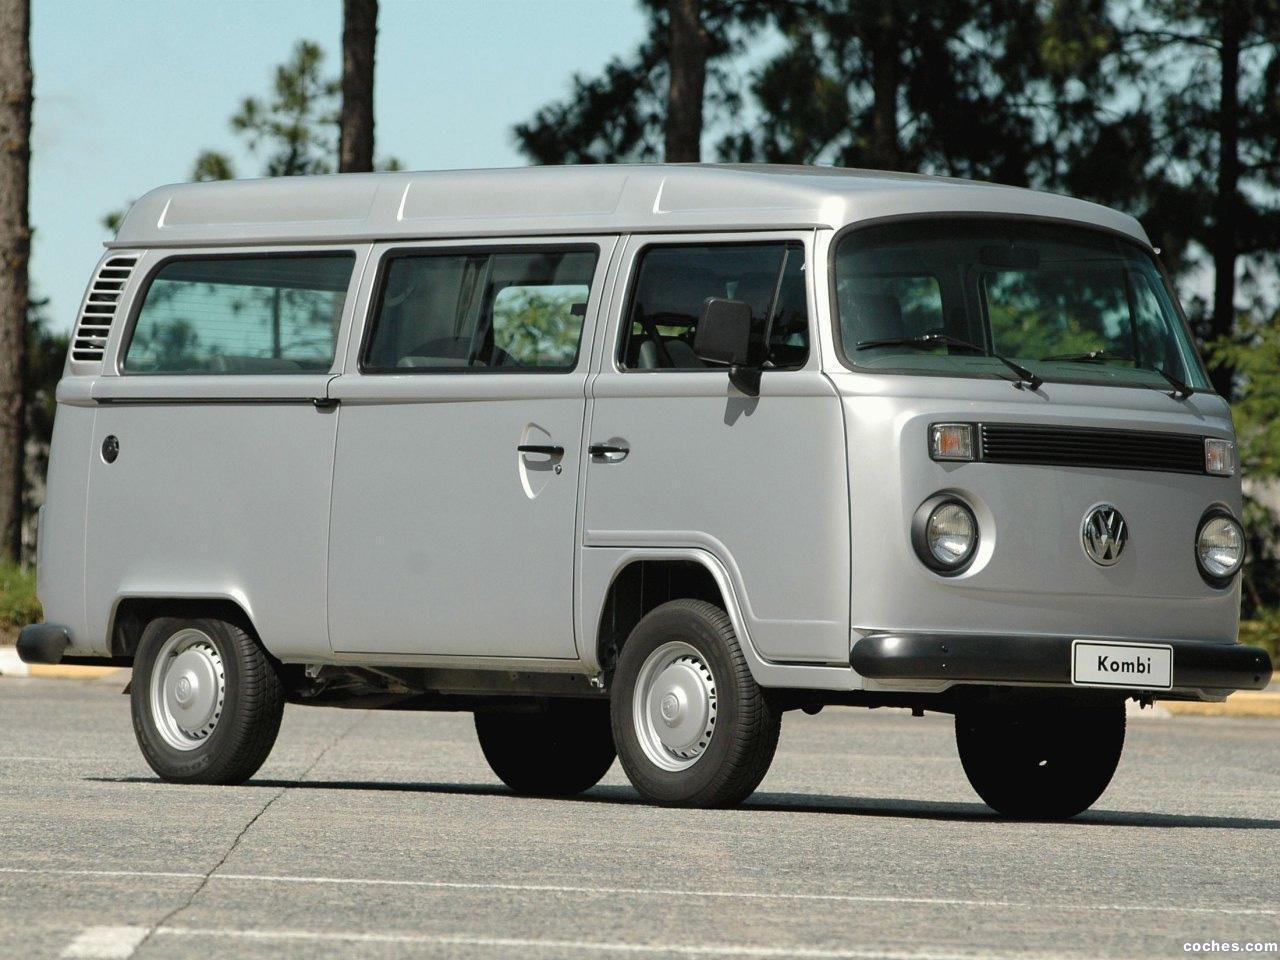 Foto 1 de Volkswagen Transporte T2 Kombi Serie Prata 2005